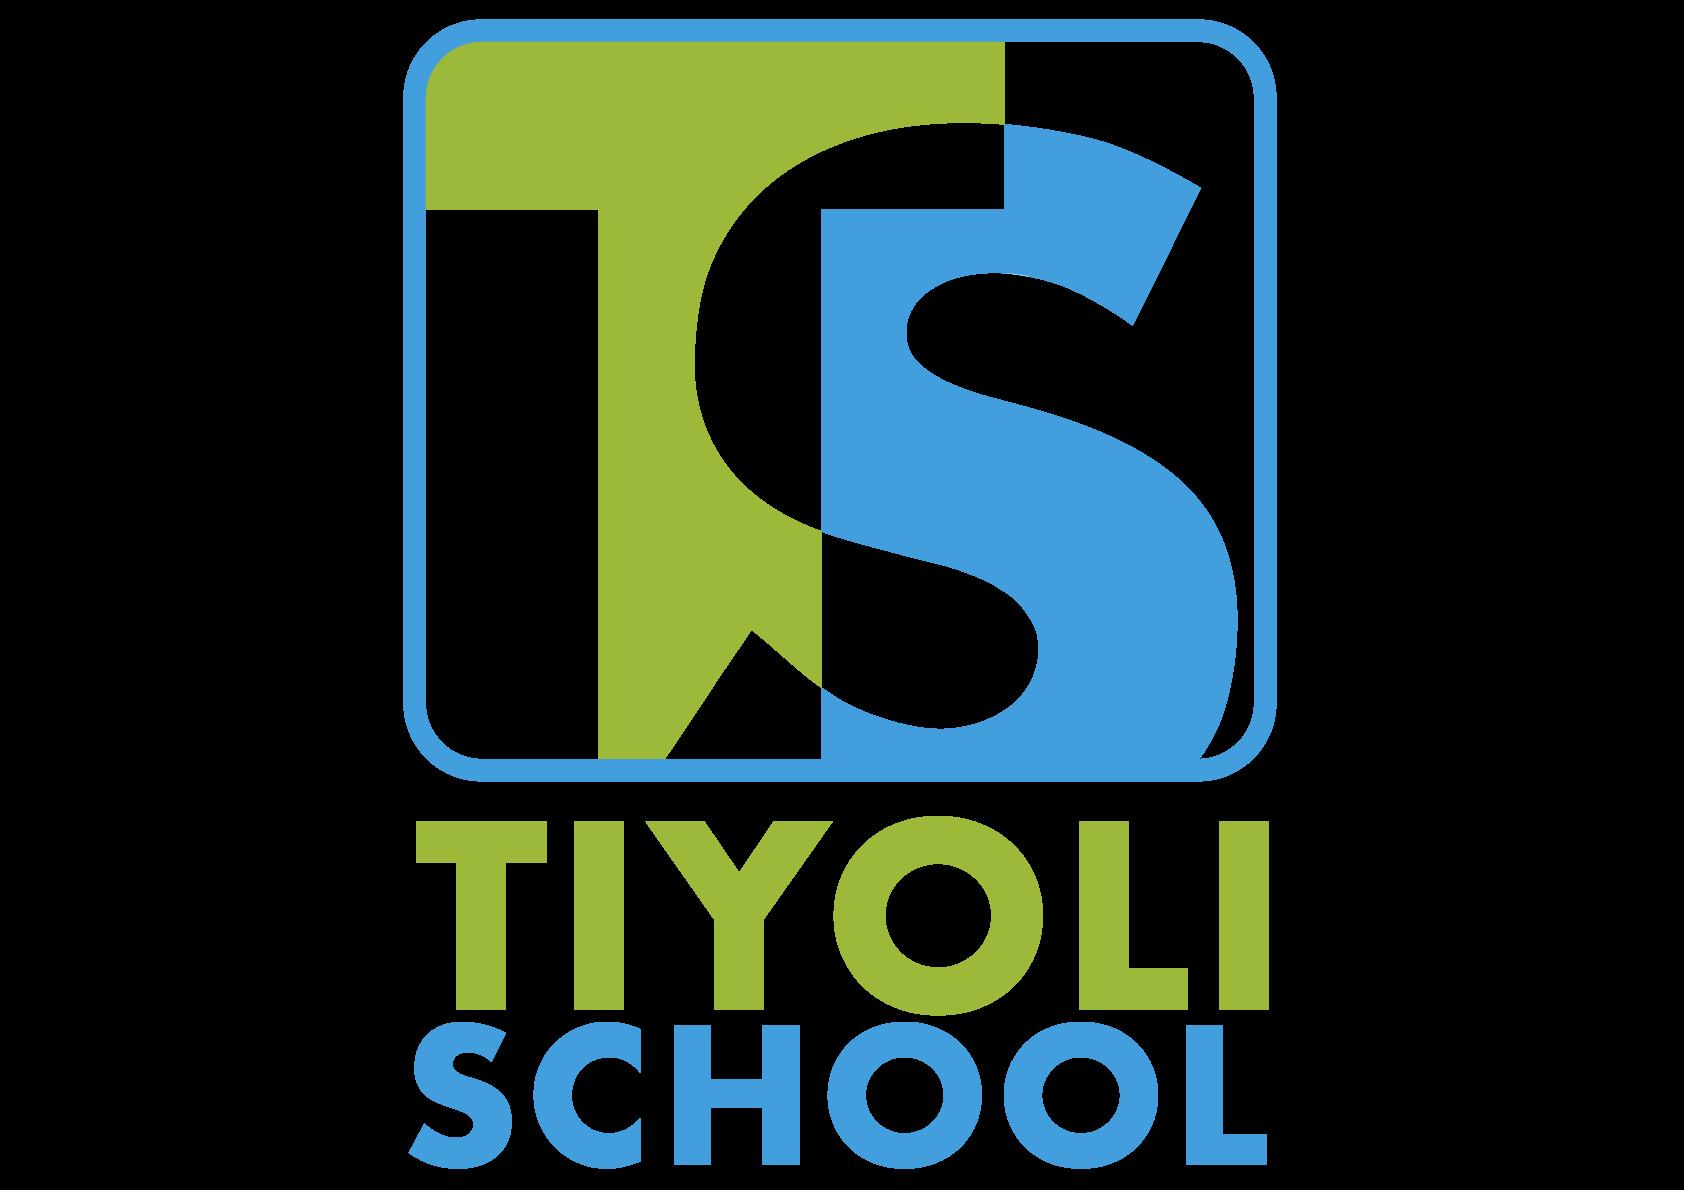 Colegio Tiyoli